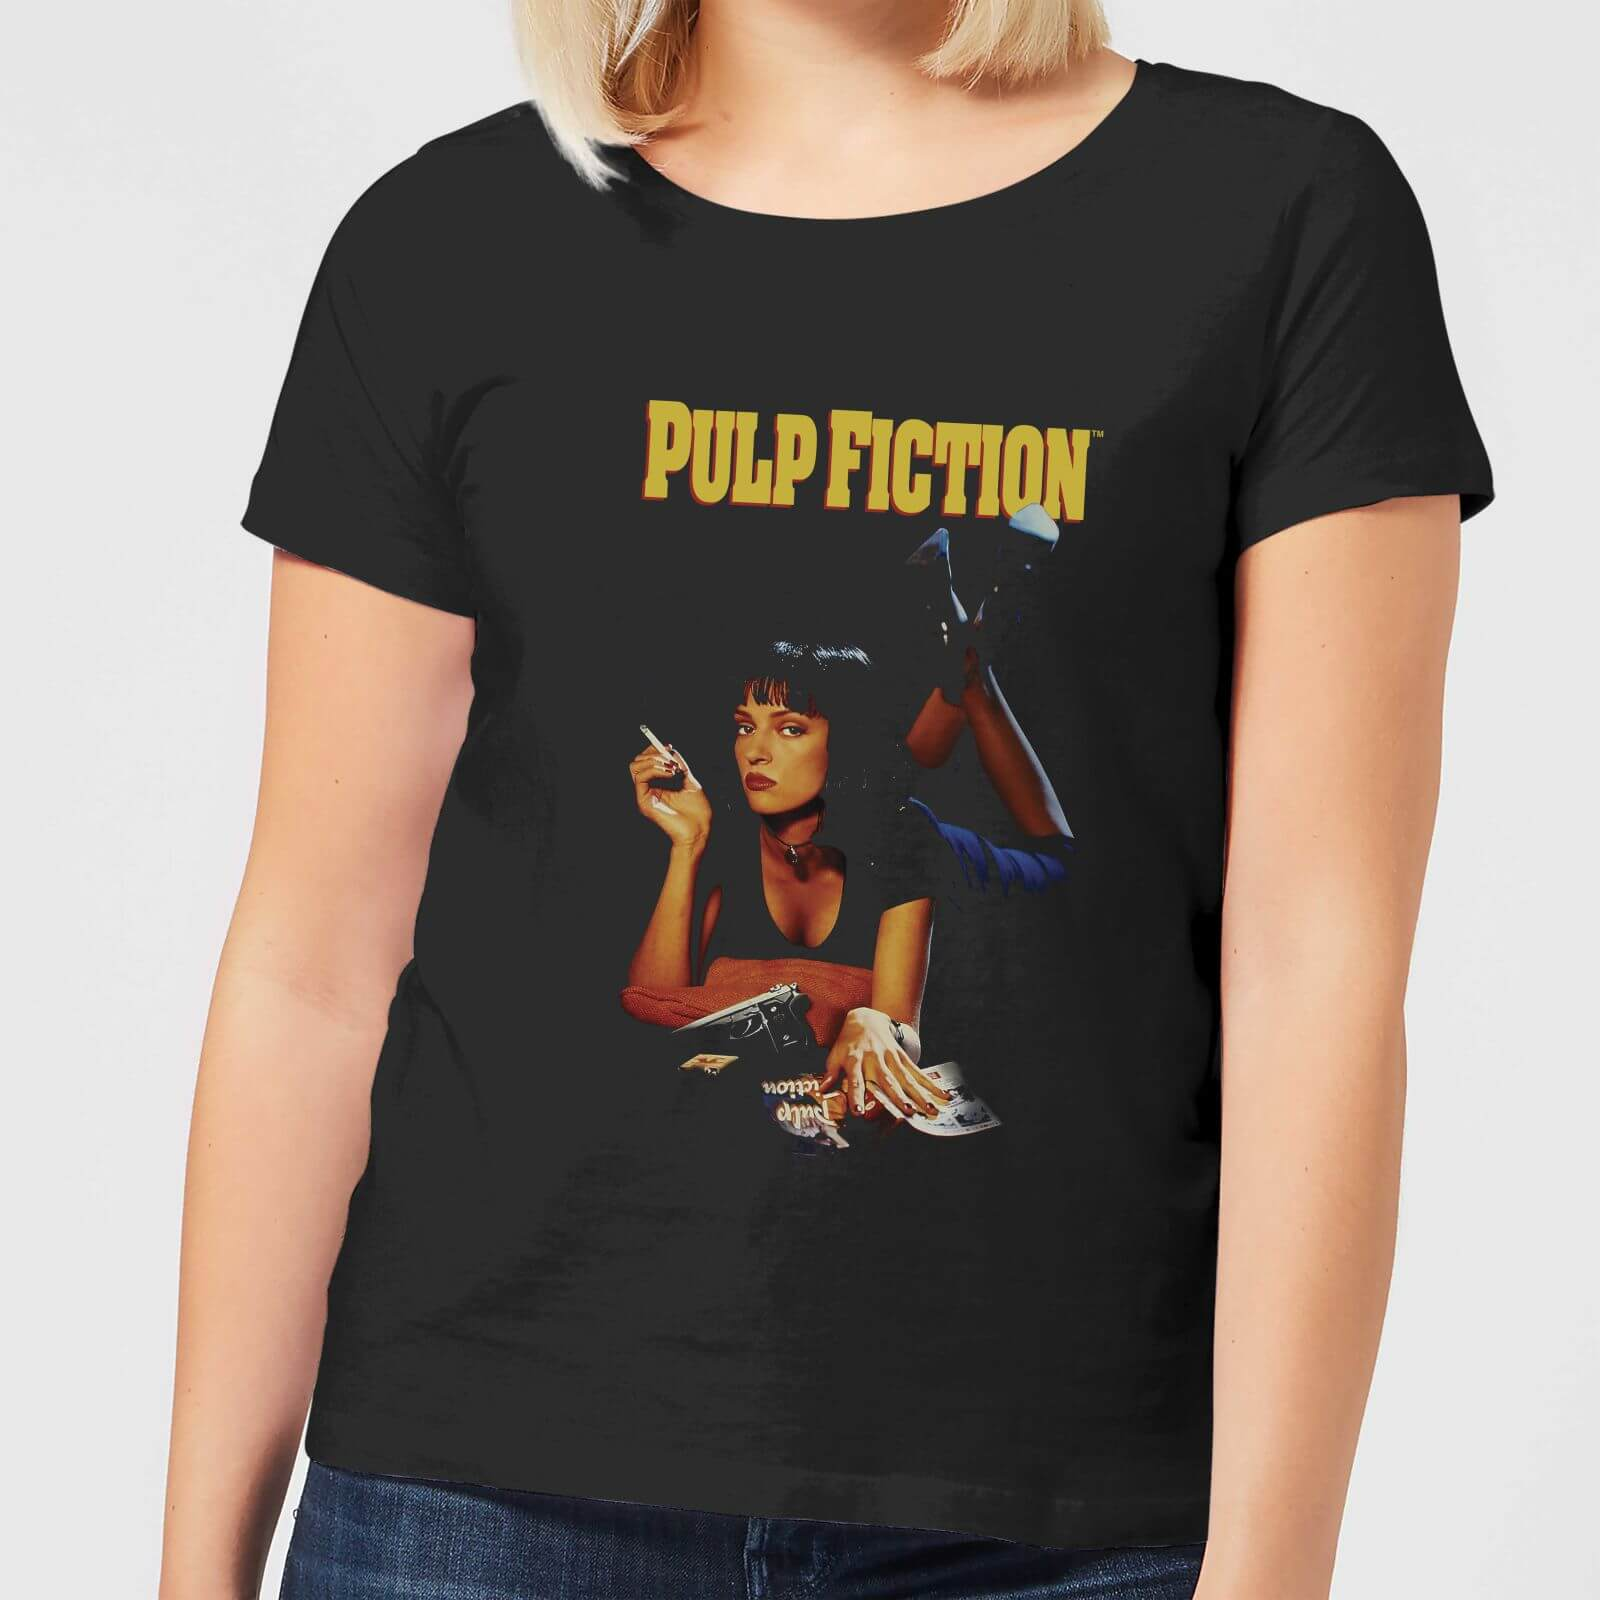 OfferteWeb.click 95-pulp-fiction-poster-women-s-t-shirt-black-xxl-nero